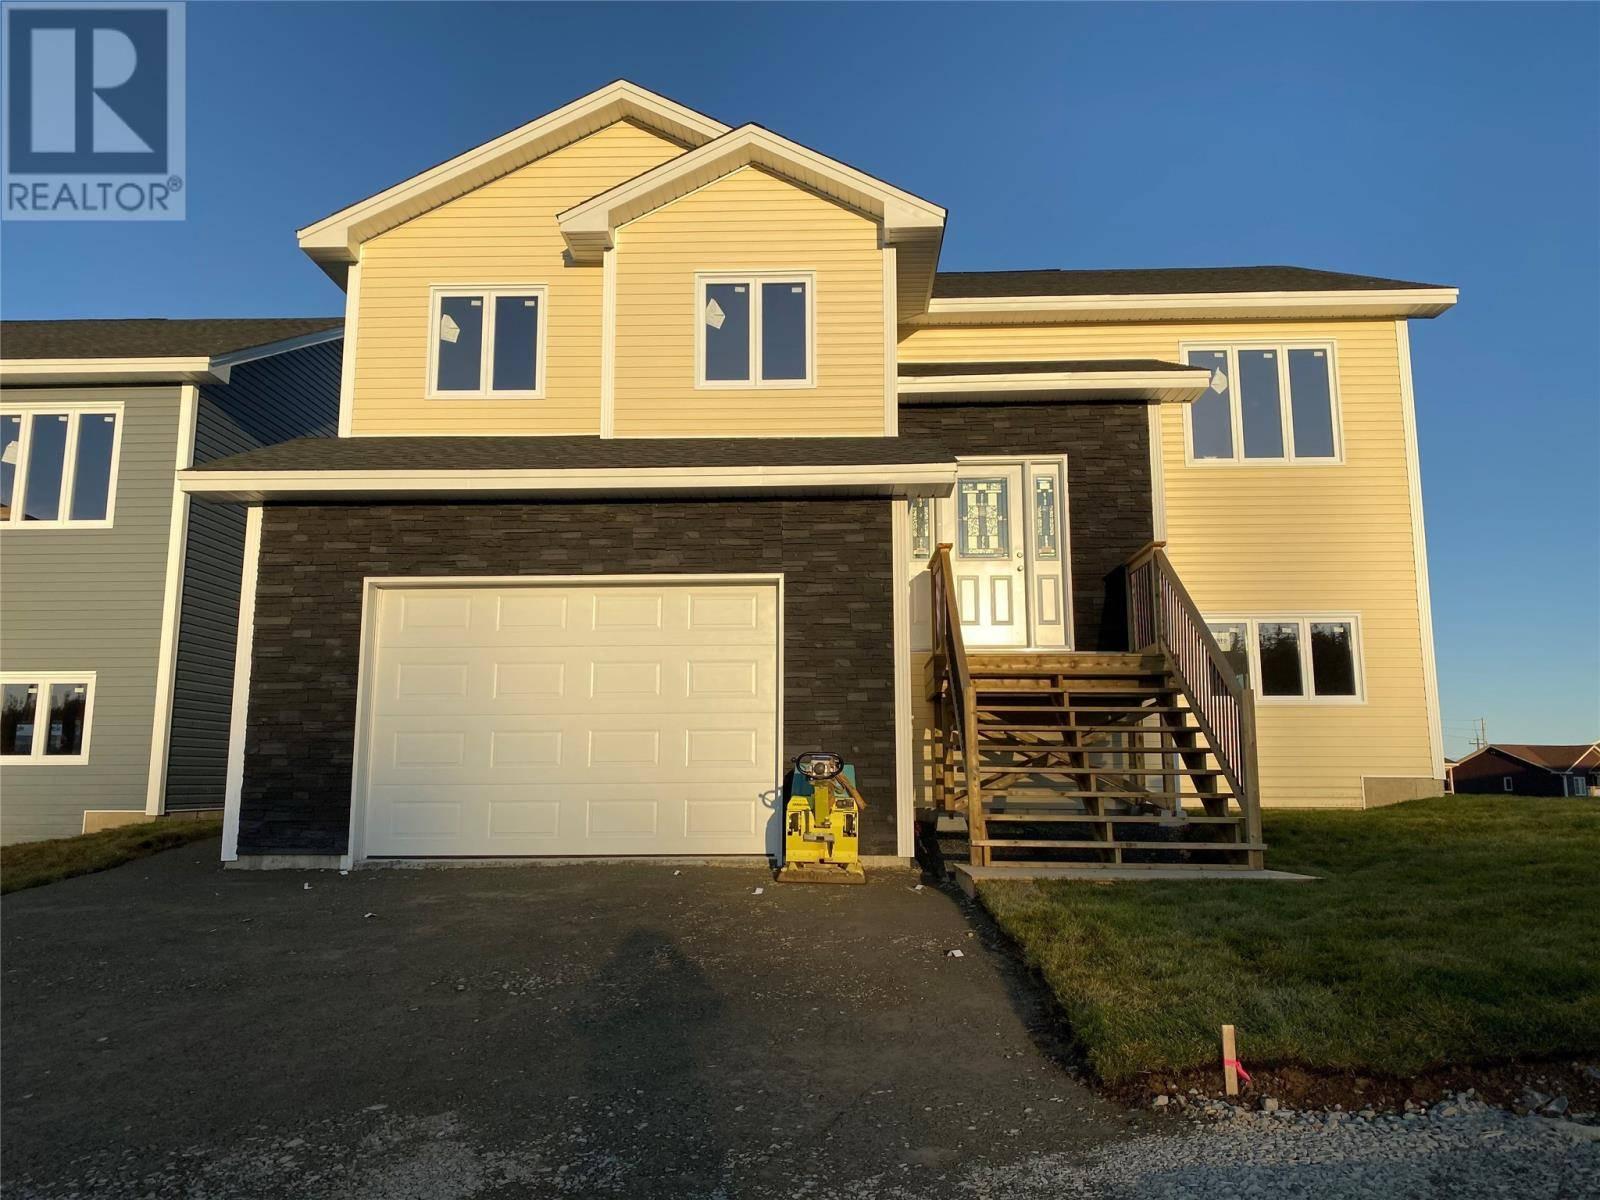 House for sale at 88 Tigress St St. John's Newfoundland - MLS: 1209380